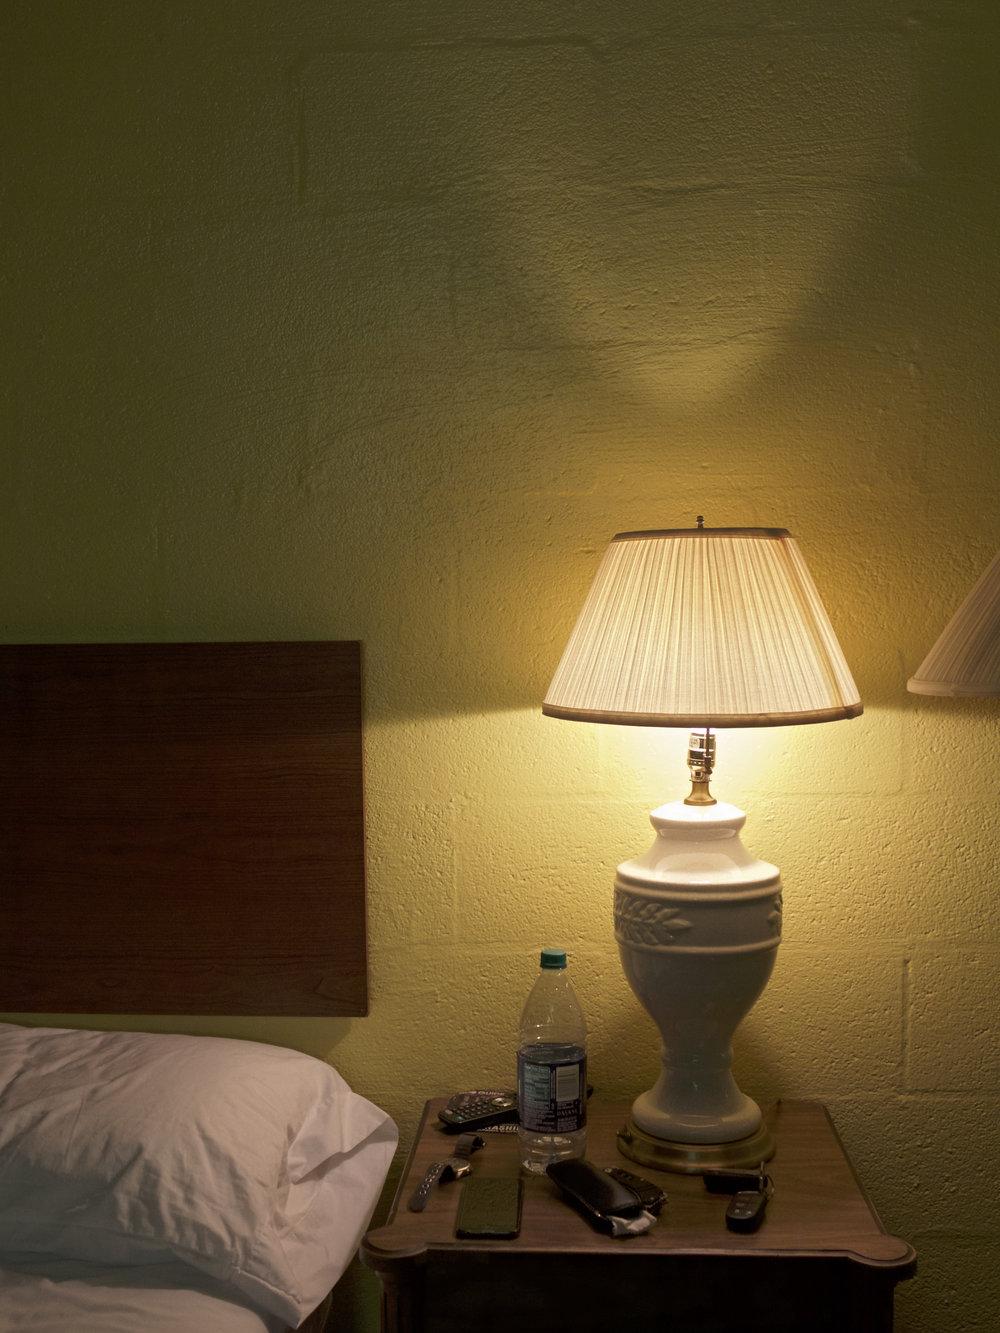 Motel_IMG_6640.jpg